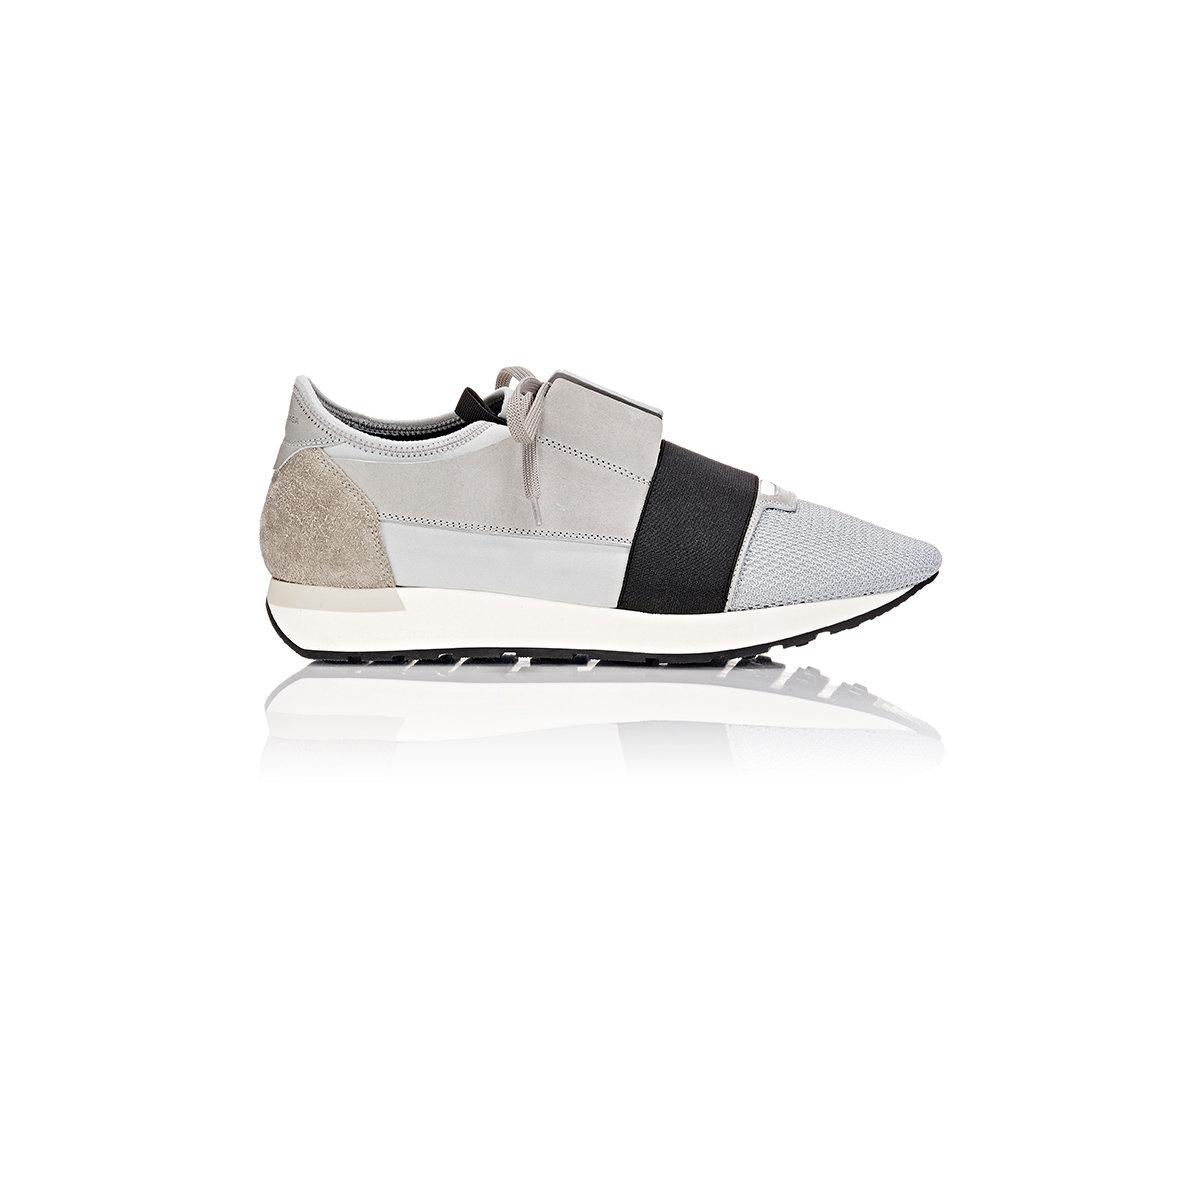 White Red Race Runner sneakers Balenciaga bdxkuL4O2h